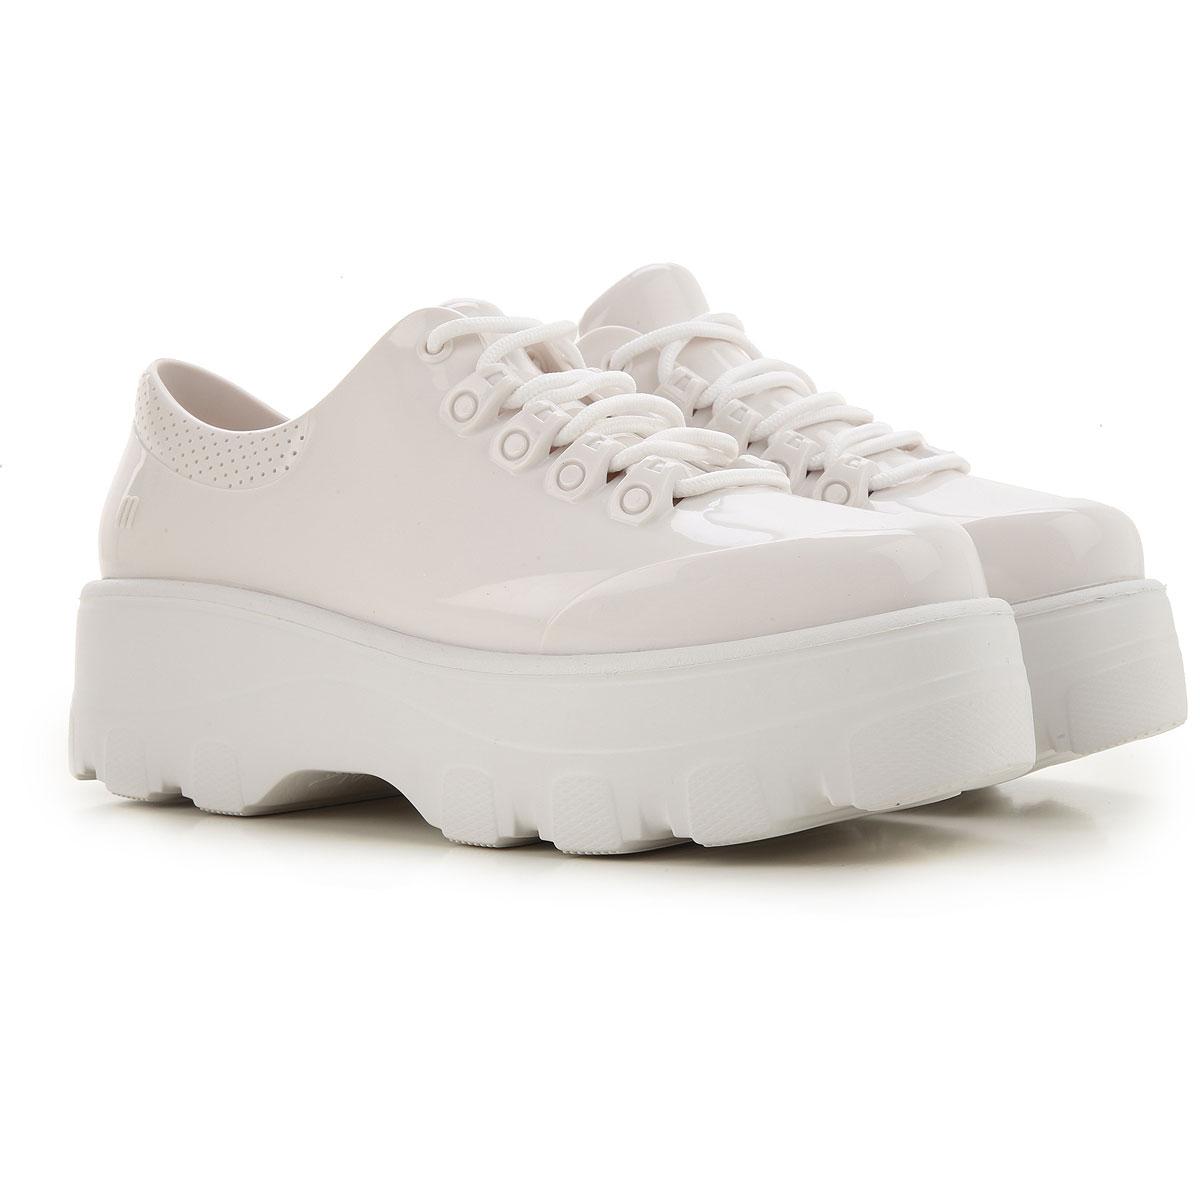 Melissa Lace Up Shoes for Men Oxfords, Derbies and Brogues On Sale, White, PVC, 2019, USA 6 - EUR 37 USA 8 - EUR 39 USA 9 - EUR 40 USA 10 - EUR 41/42